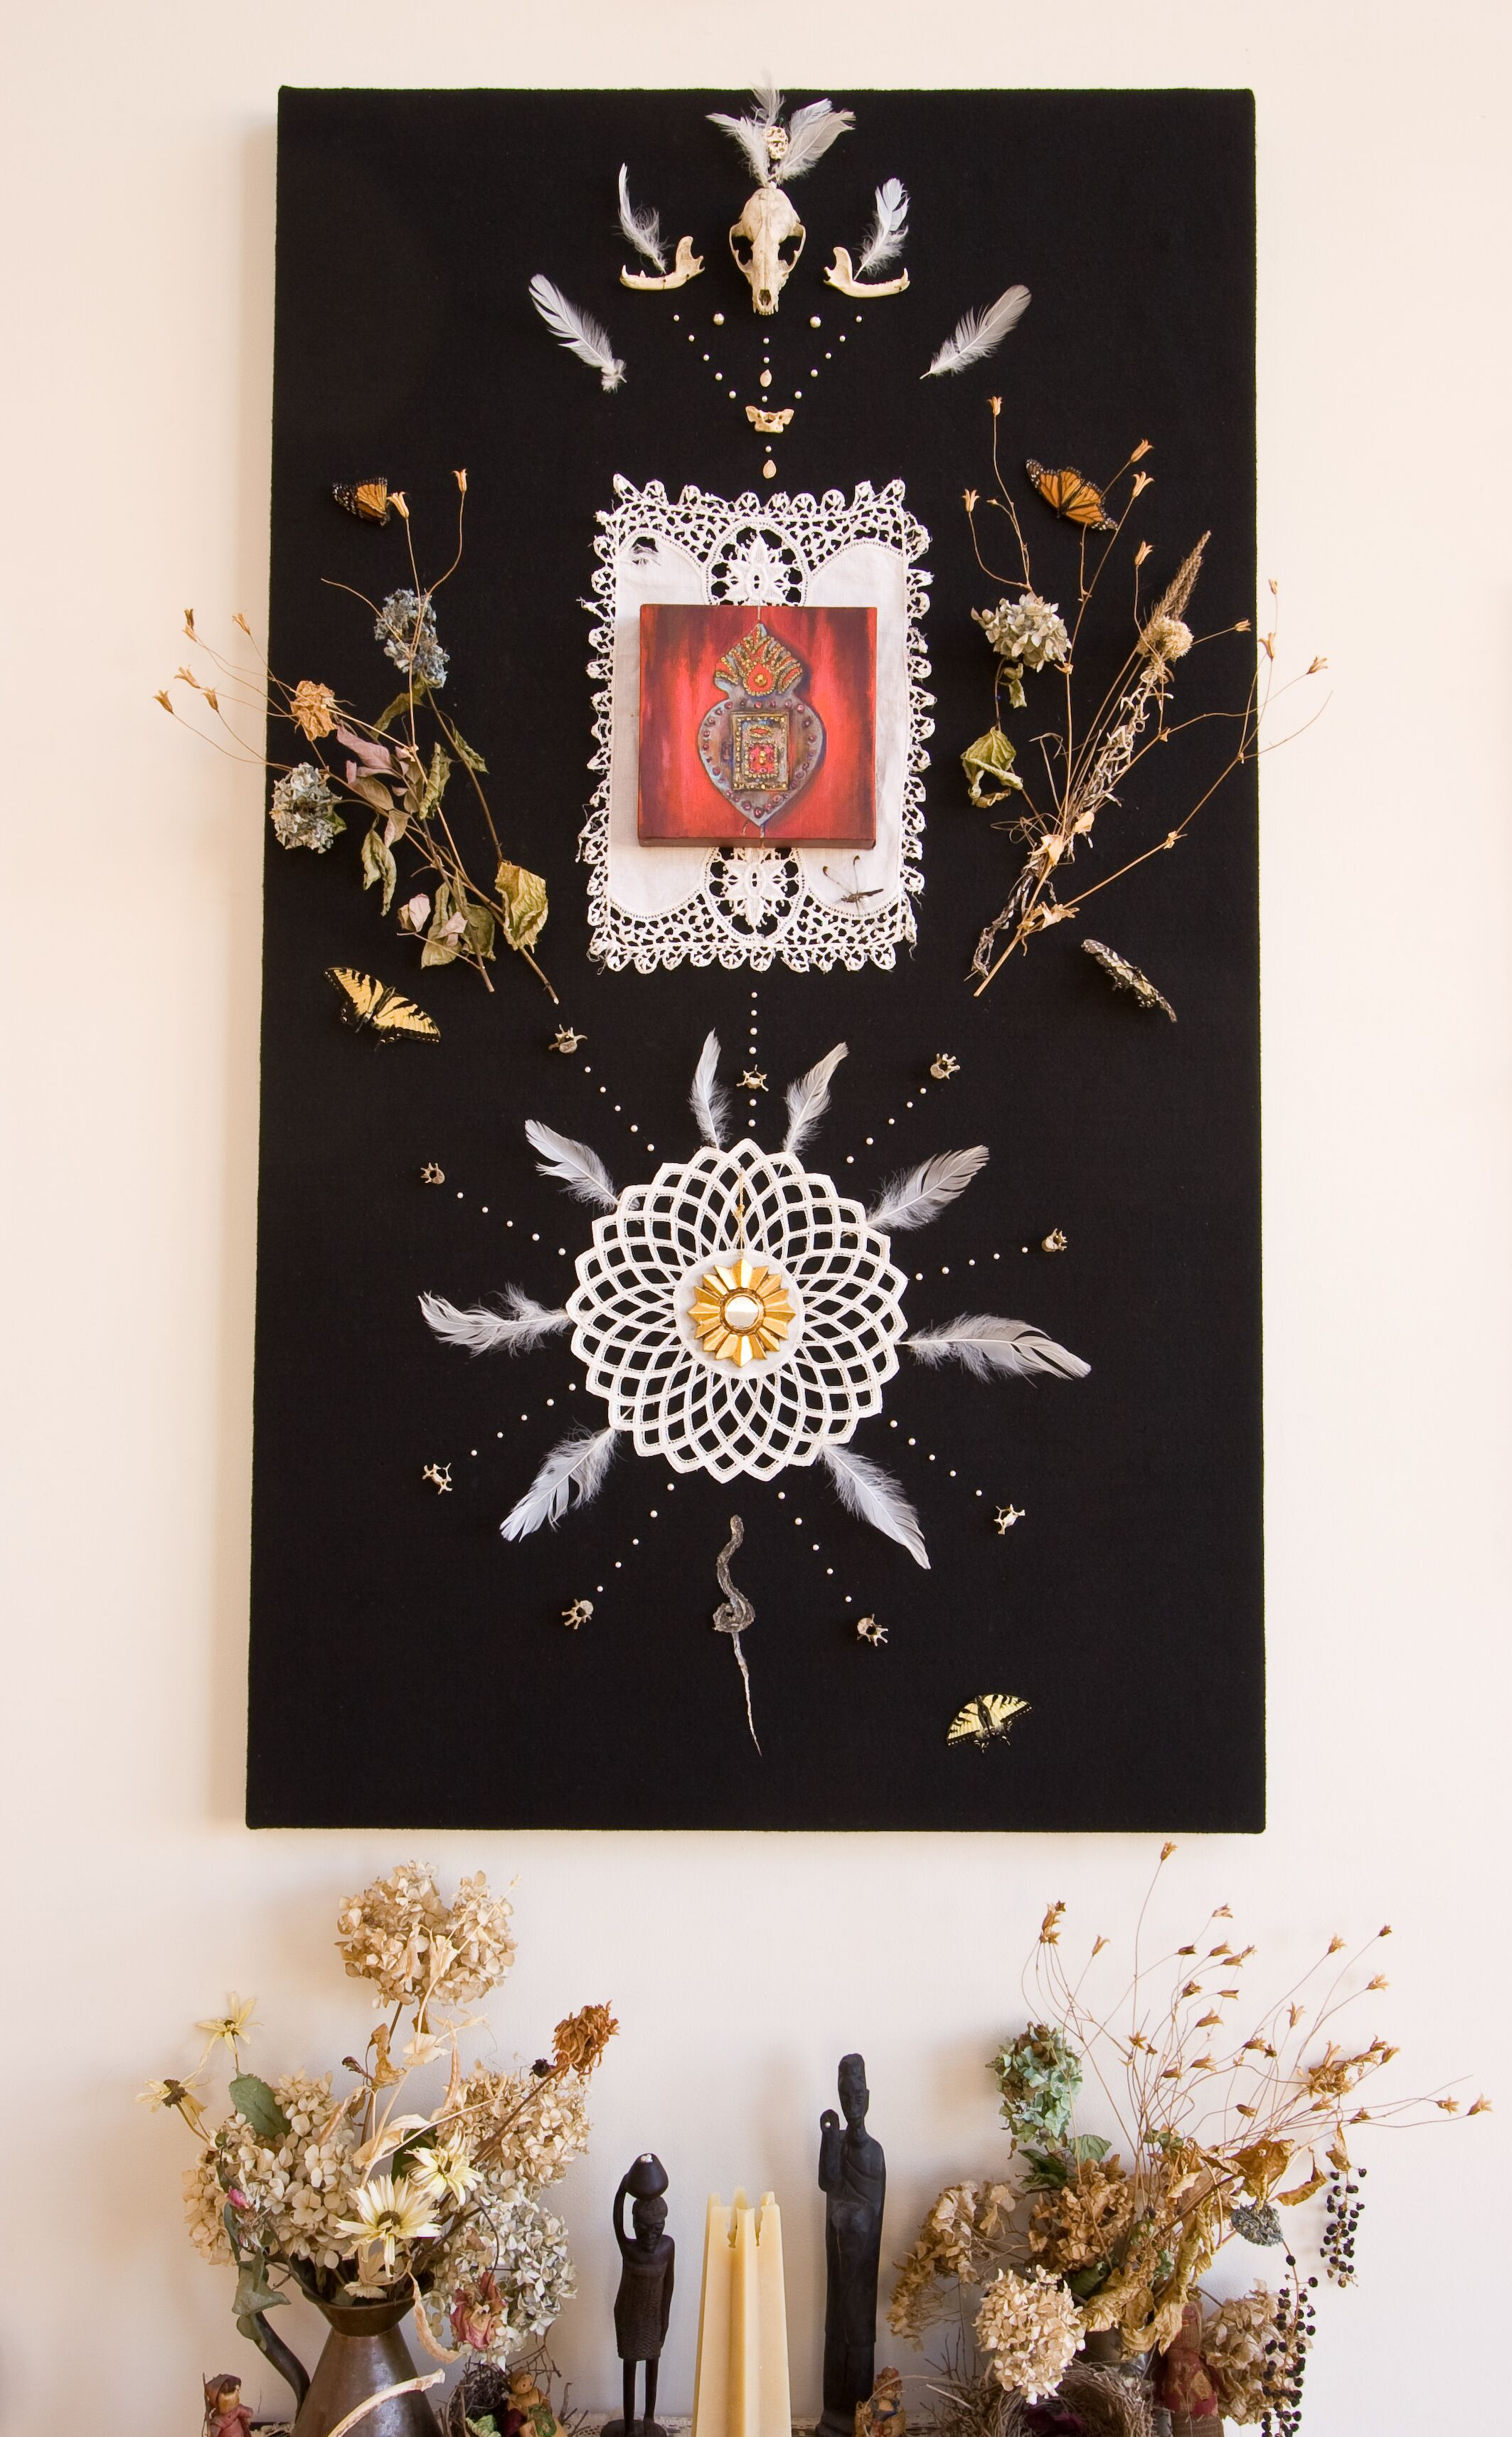 Altar - Seeking the Way DETAIL